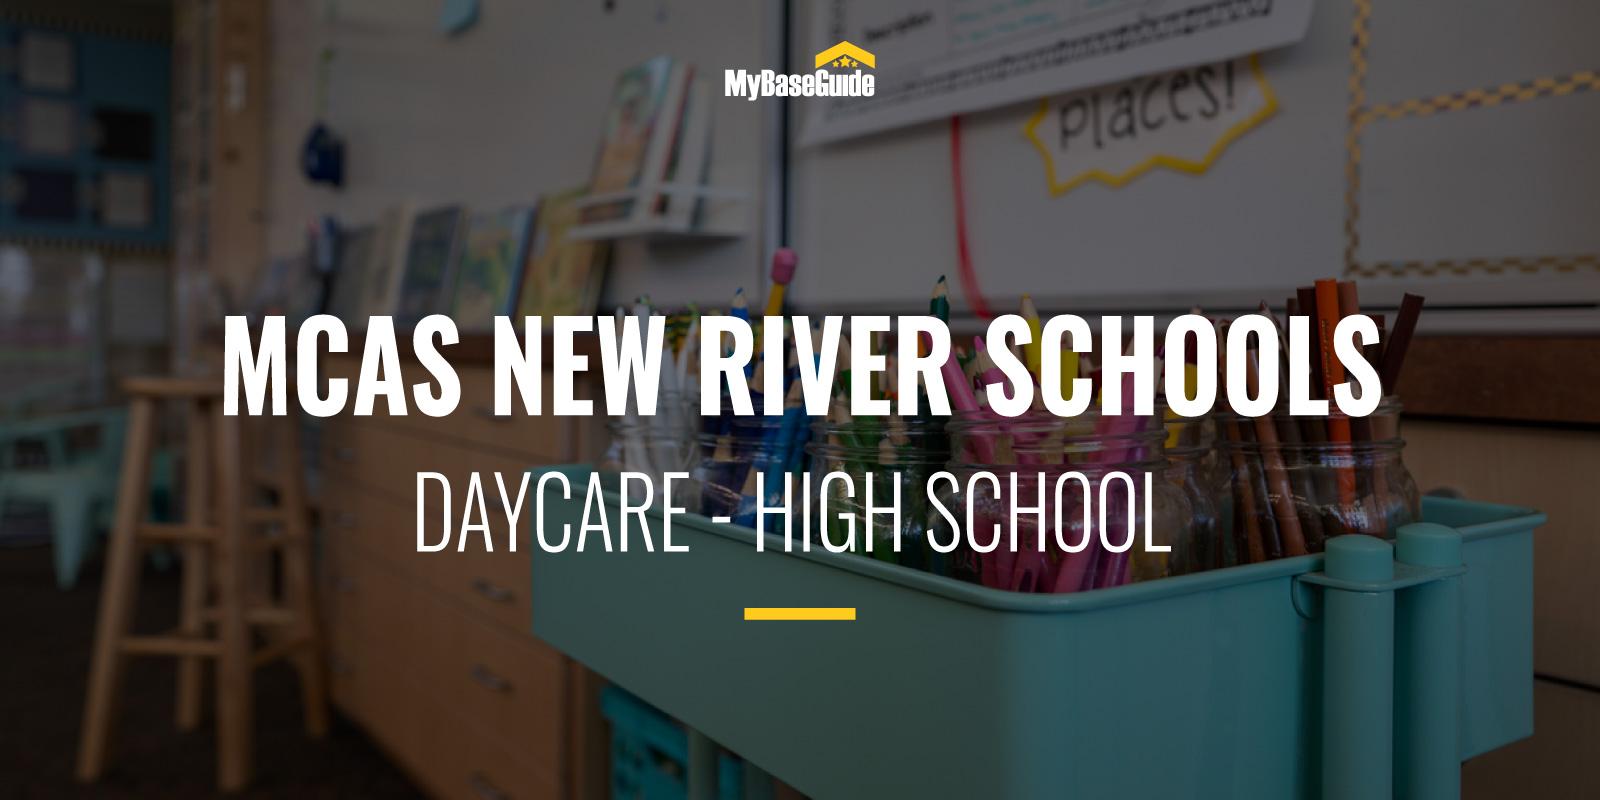 MCAS New River Schools: Daycare - High School